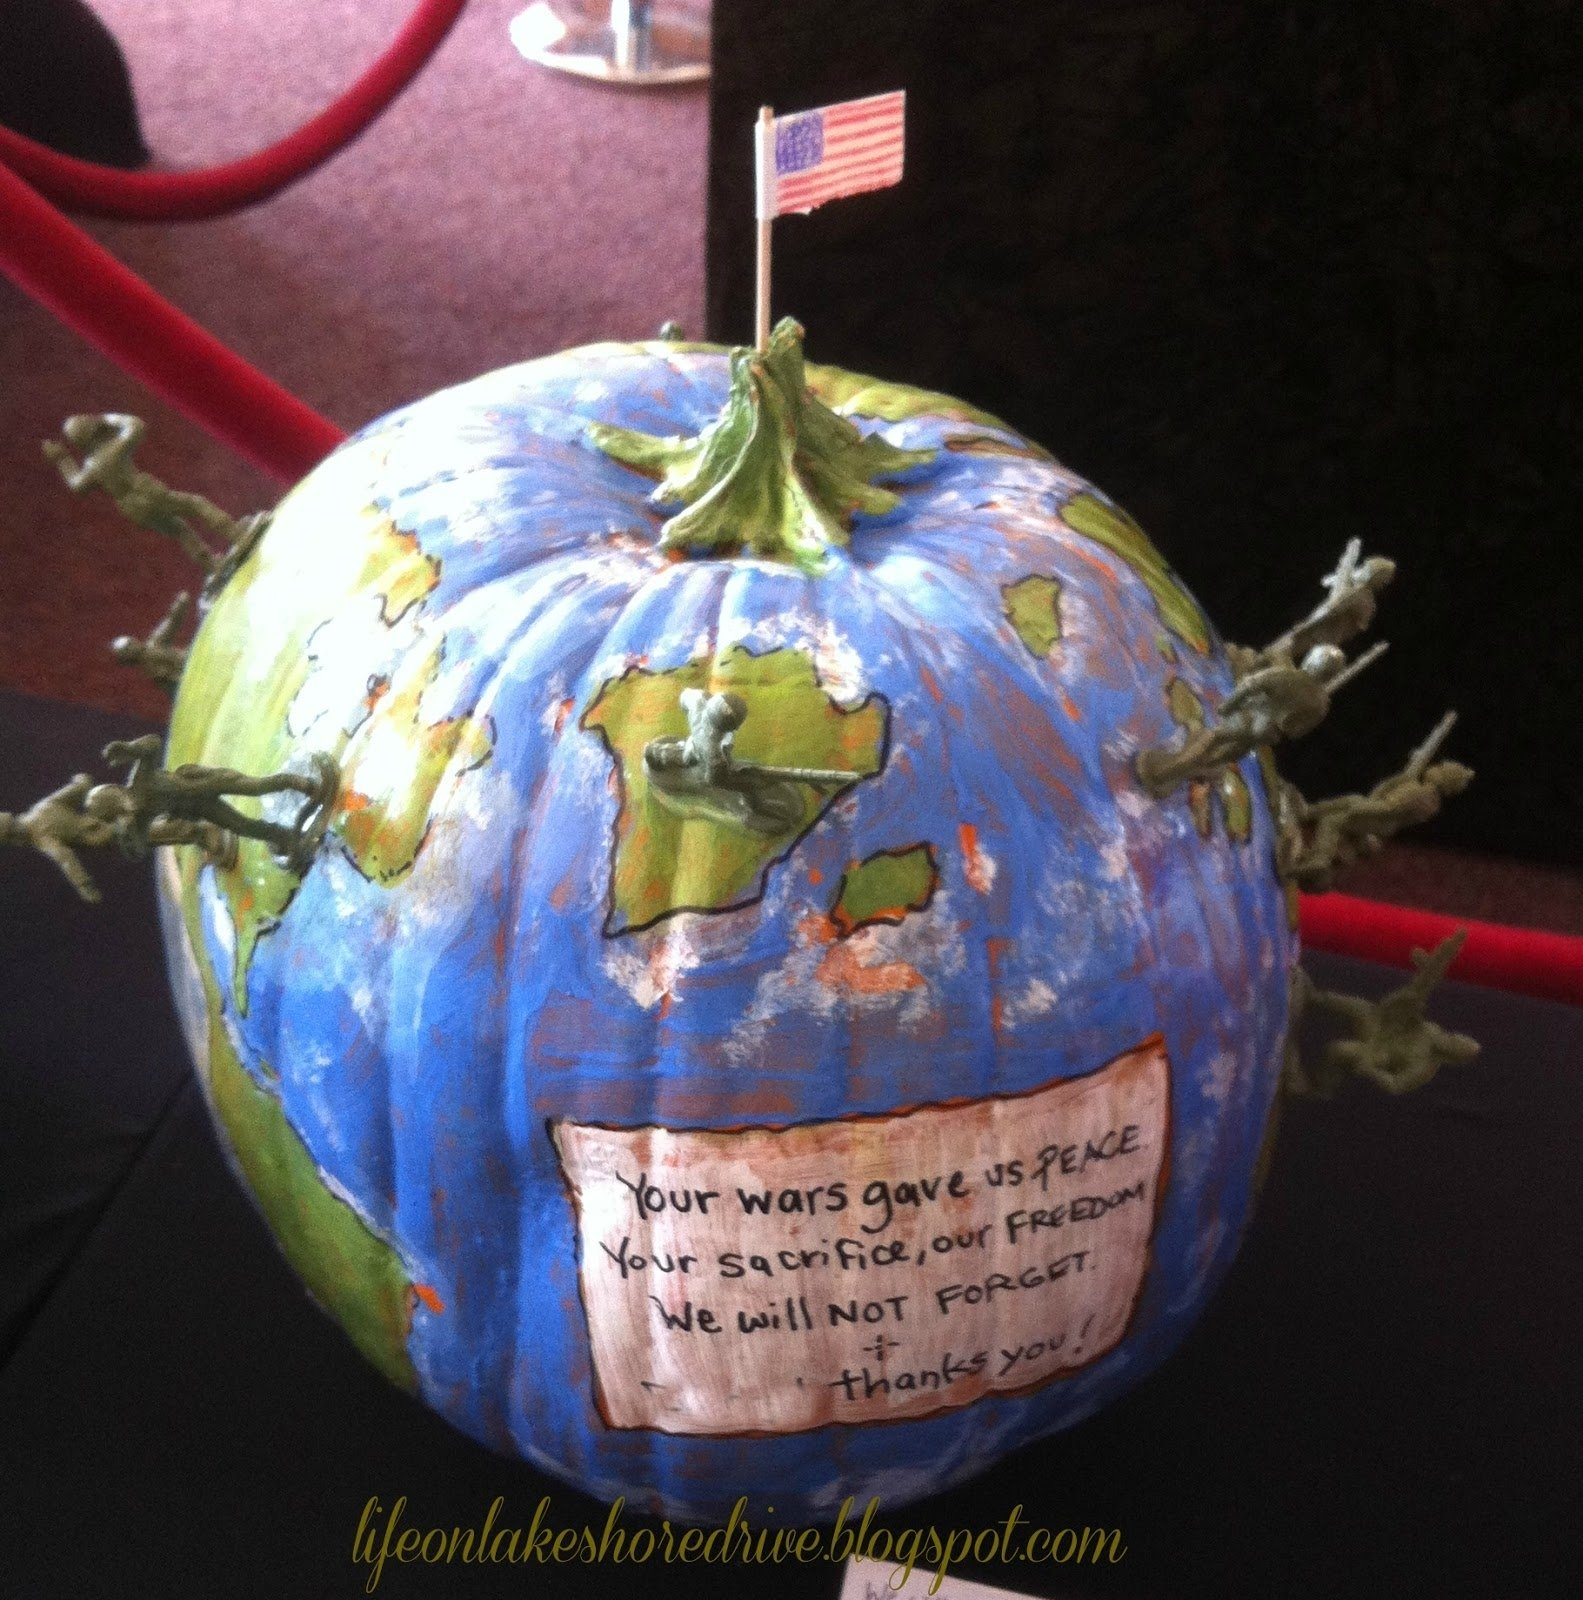 10 Beautiful Pumpkin Decorating Ideas No Carve creative pumpkin decorating ideas without carving my web value 1 2020